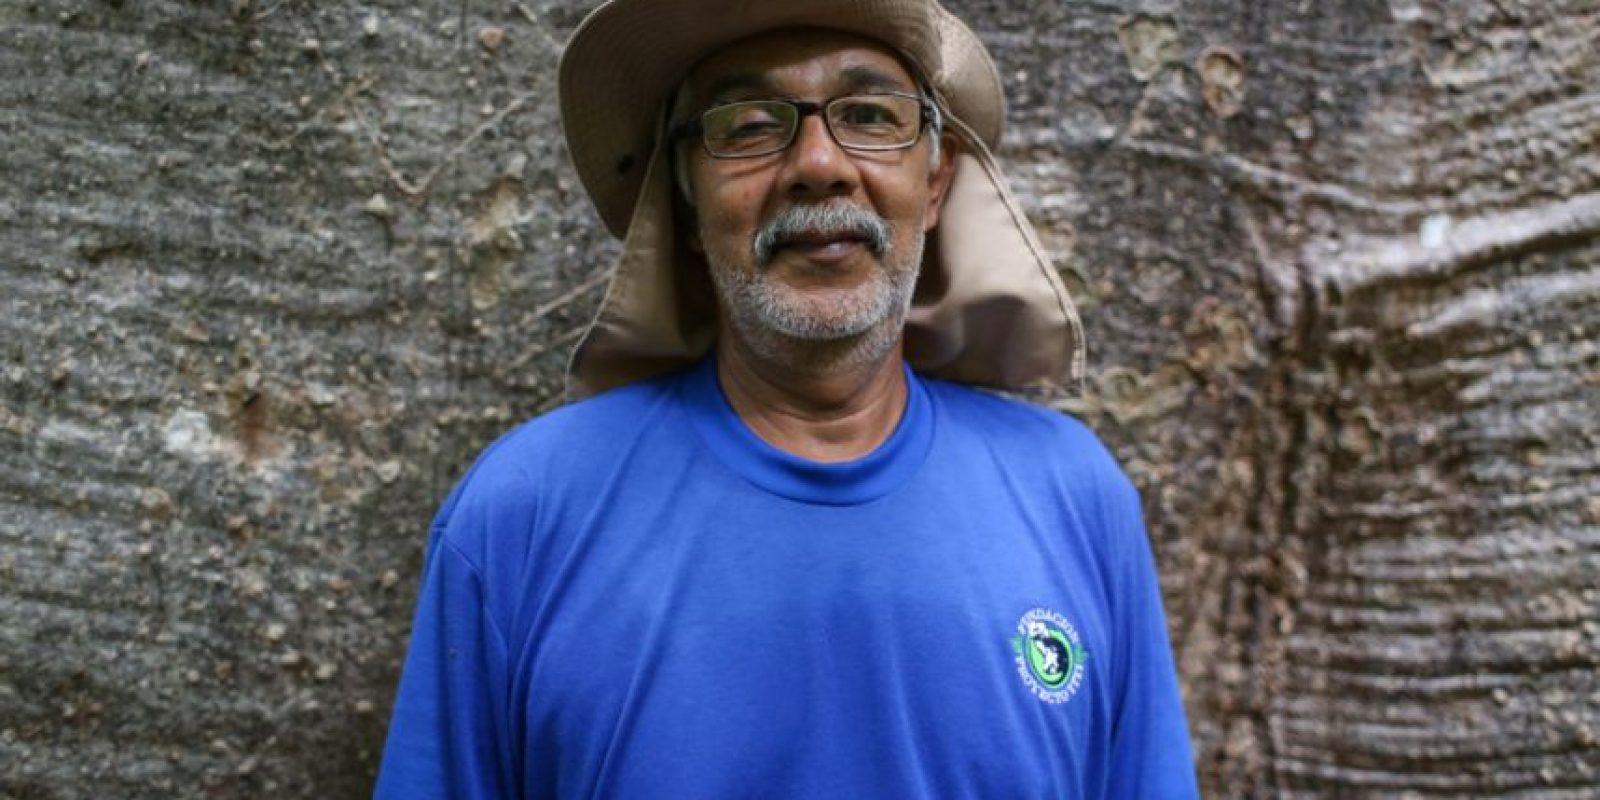 Luis Hernando Soto, biólogo Foto:César Nigrinis Name